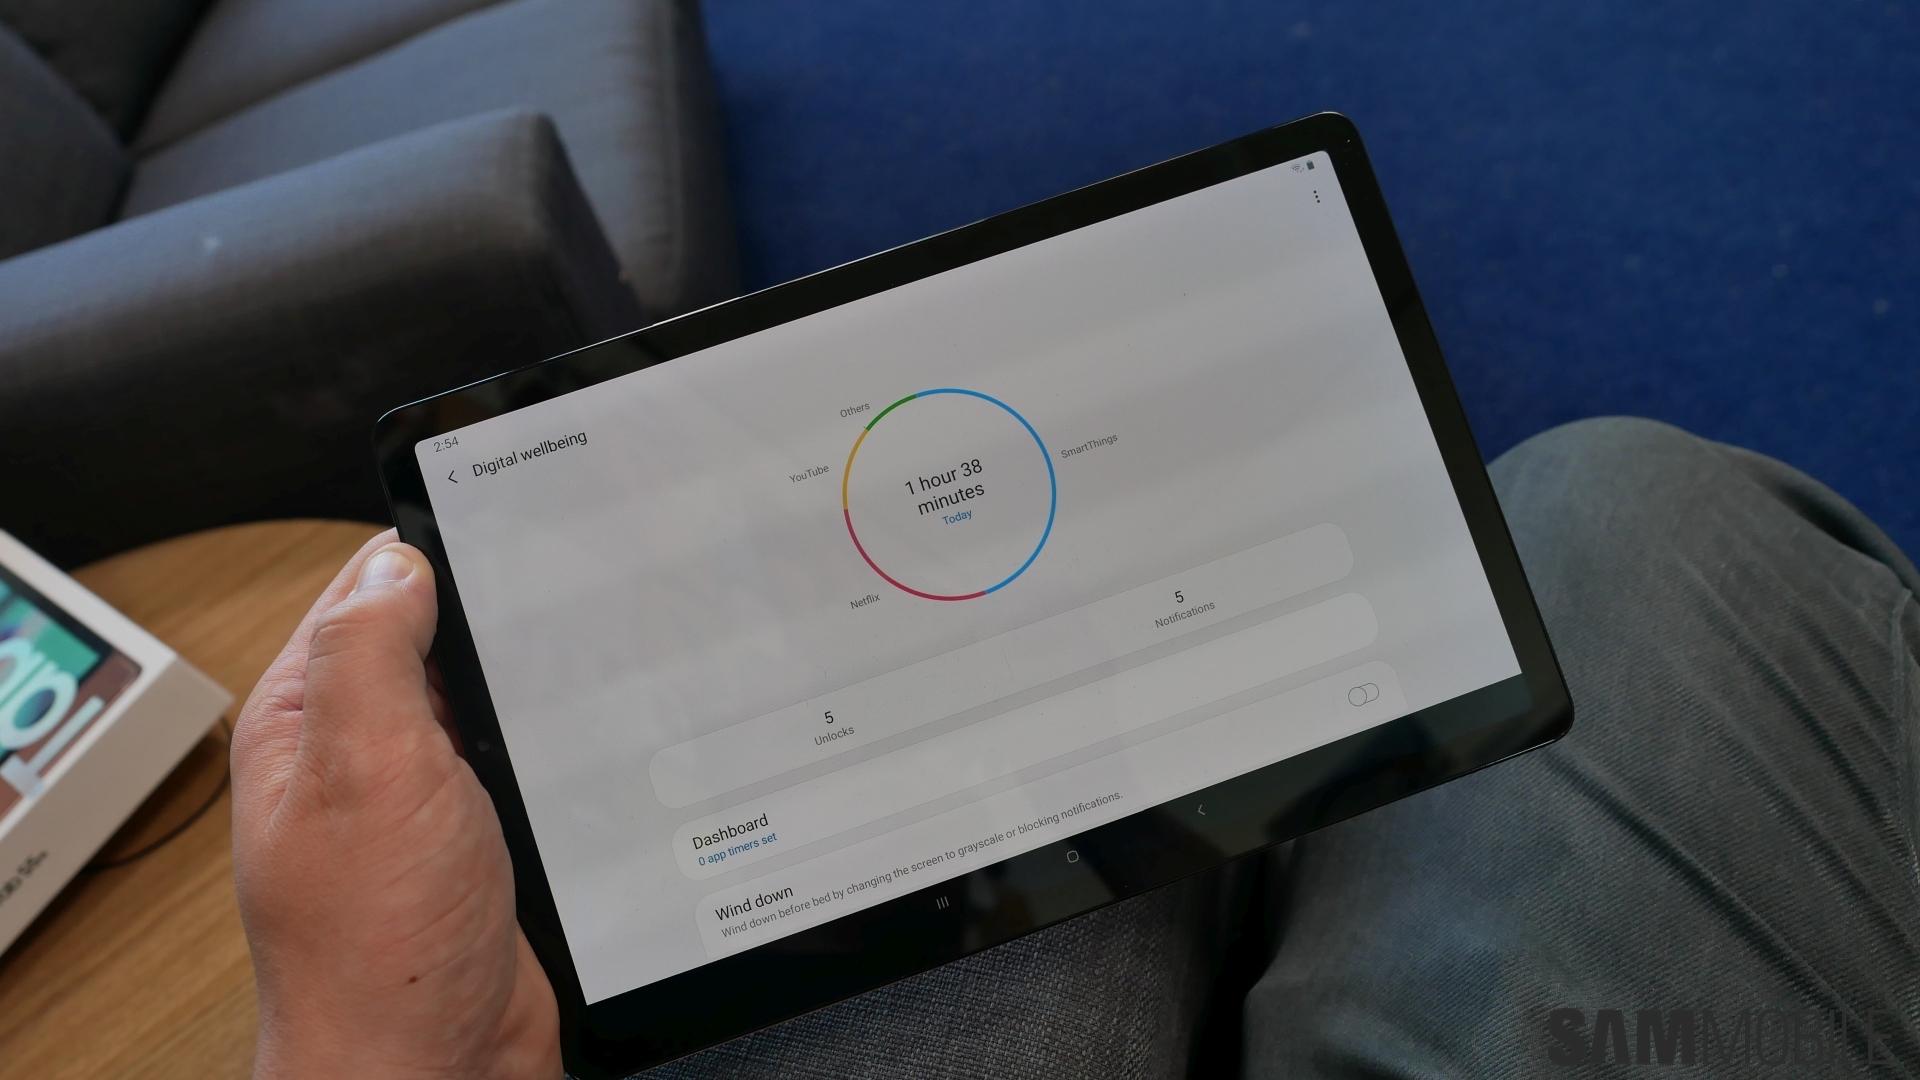 Samsung Tablet Phone App